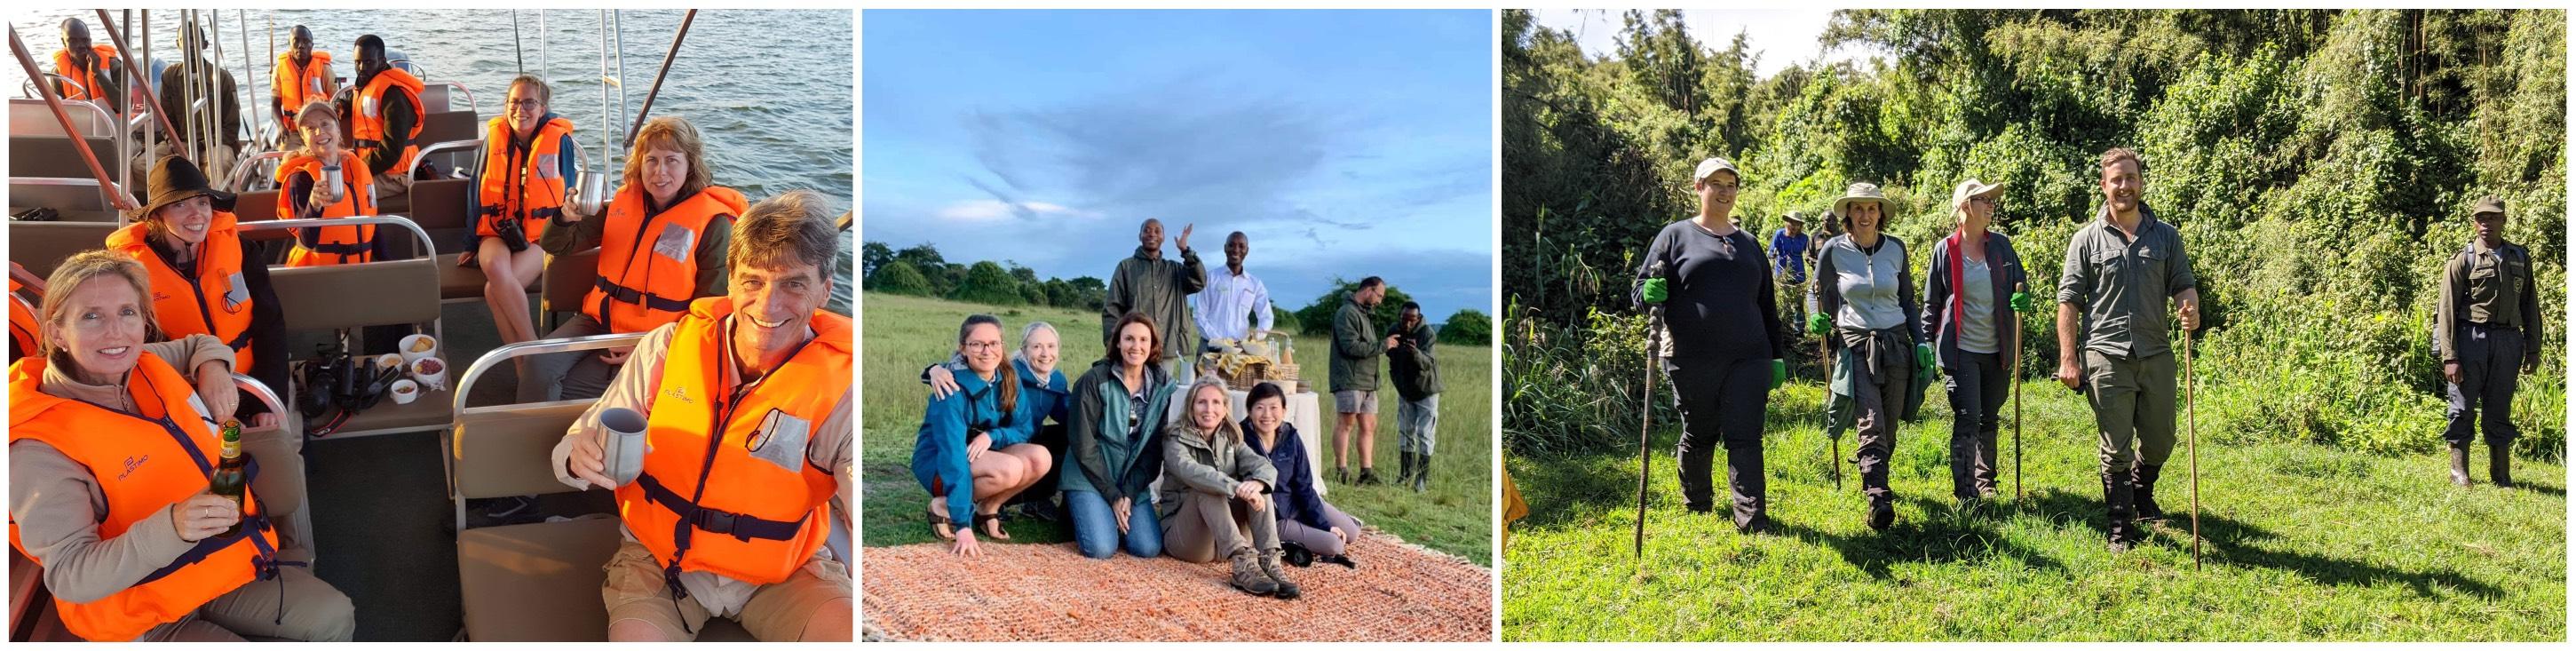 safari activities group